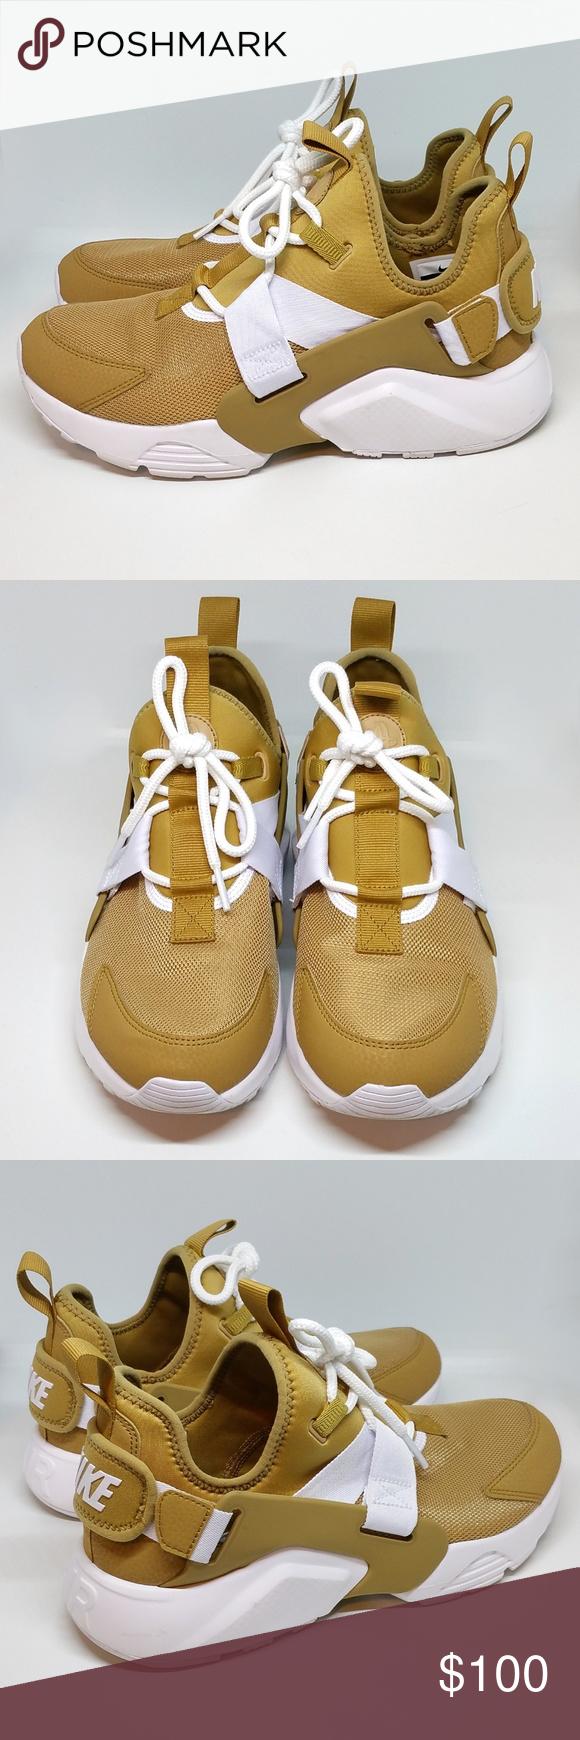 ae94c834f65d Nike Air Huarache City Low Elemental Gold AH6804 Amazing gently used Nike  Air Huarache City Low